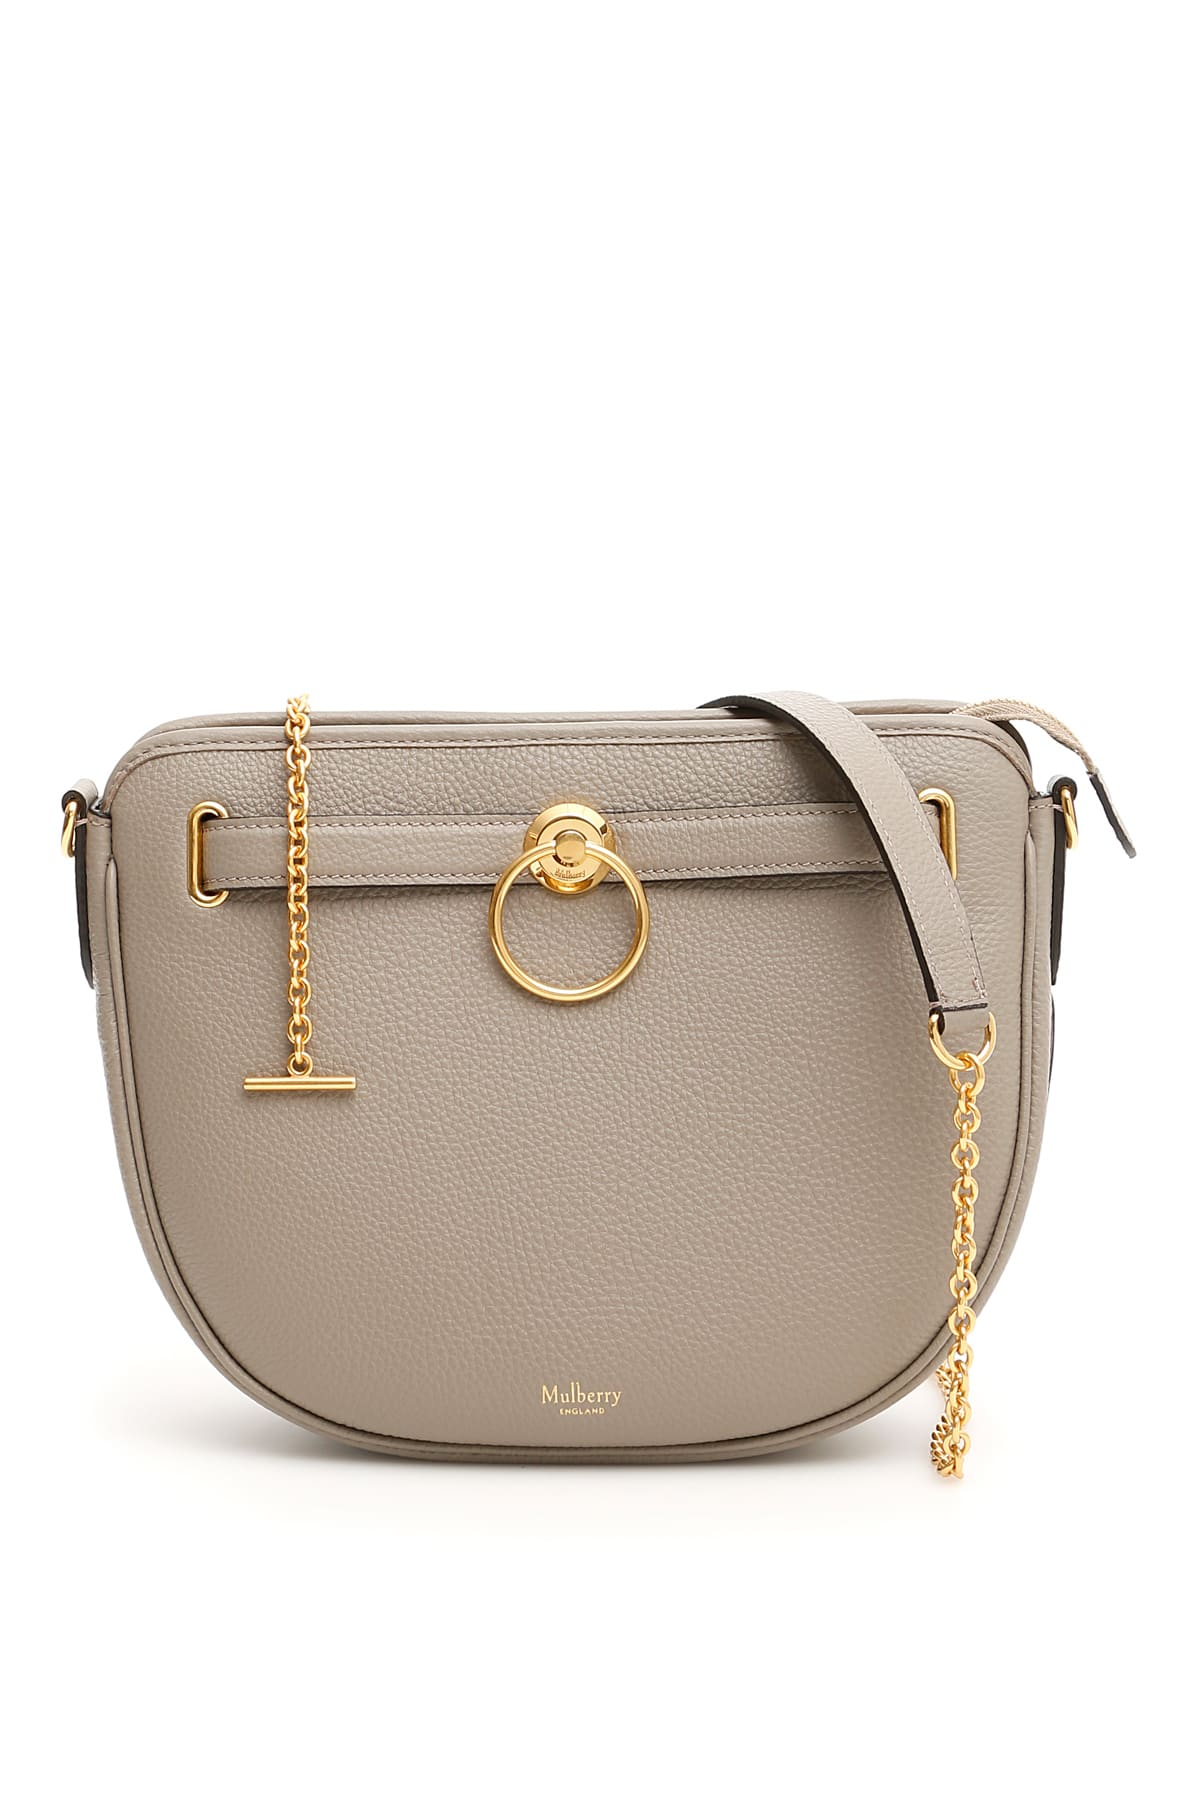 Mulberry Brockwell Crossbody Bag